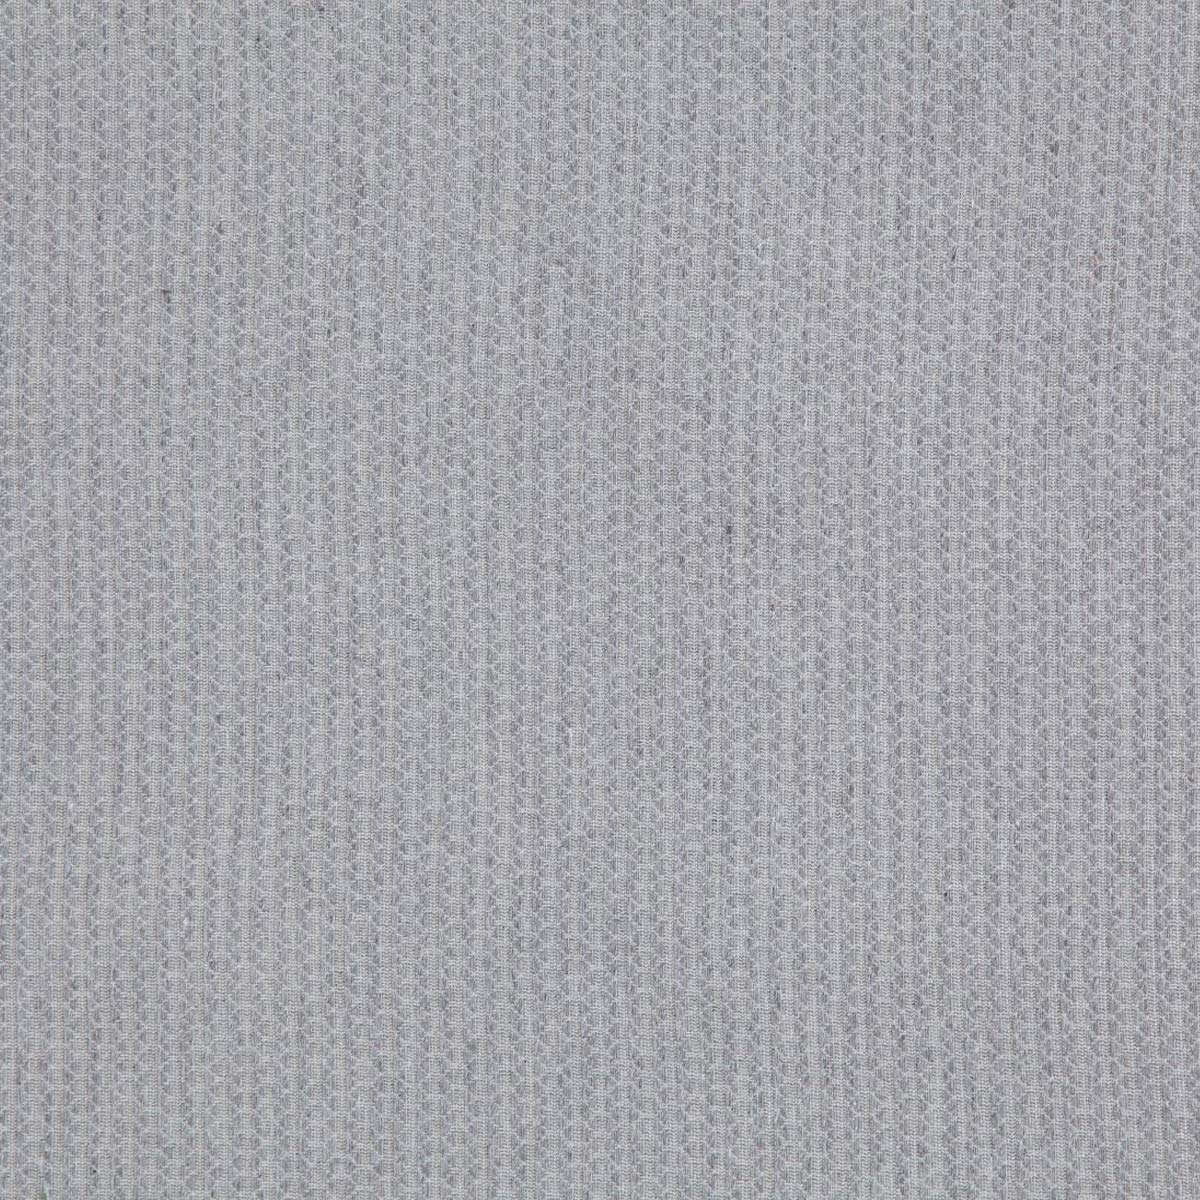 Cortina Rústica Sevilha Prata 3,00 x 2,30 Bella Janela